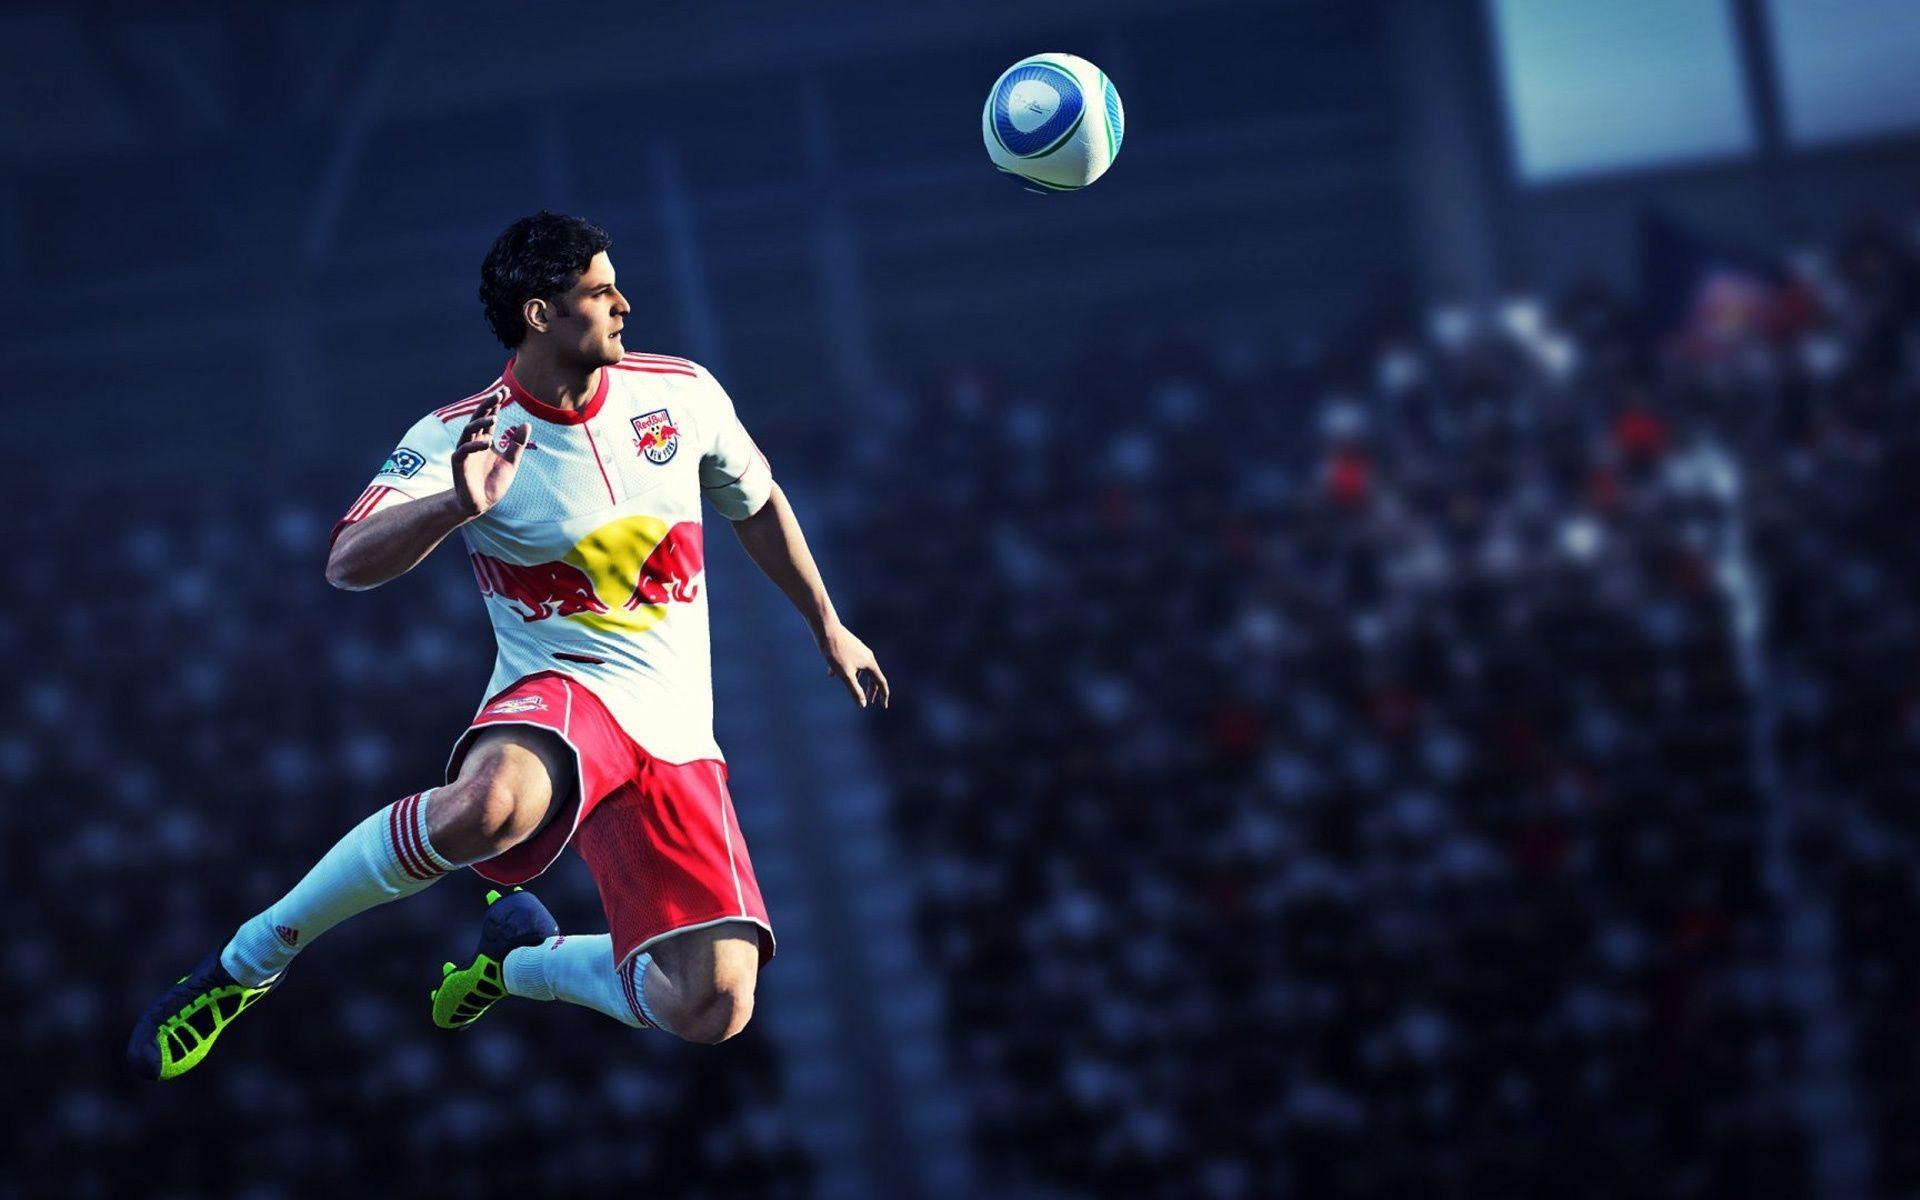 soccer field wallpaper hd, cool soccer balls images